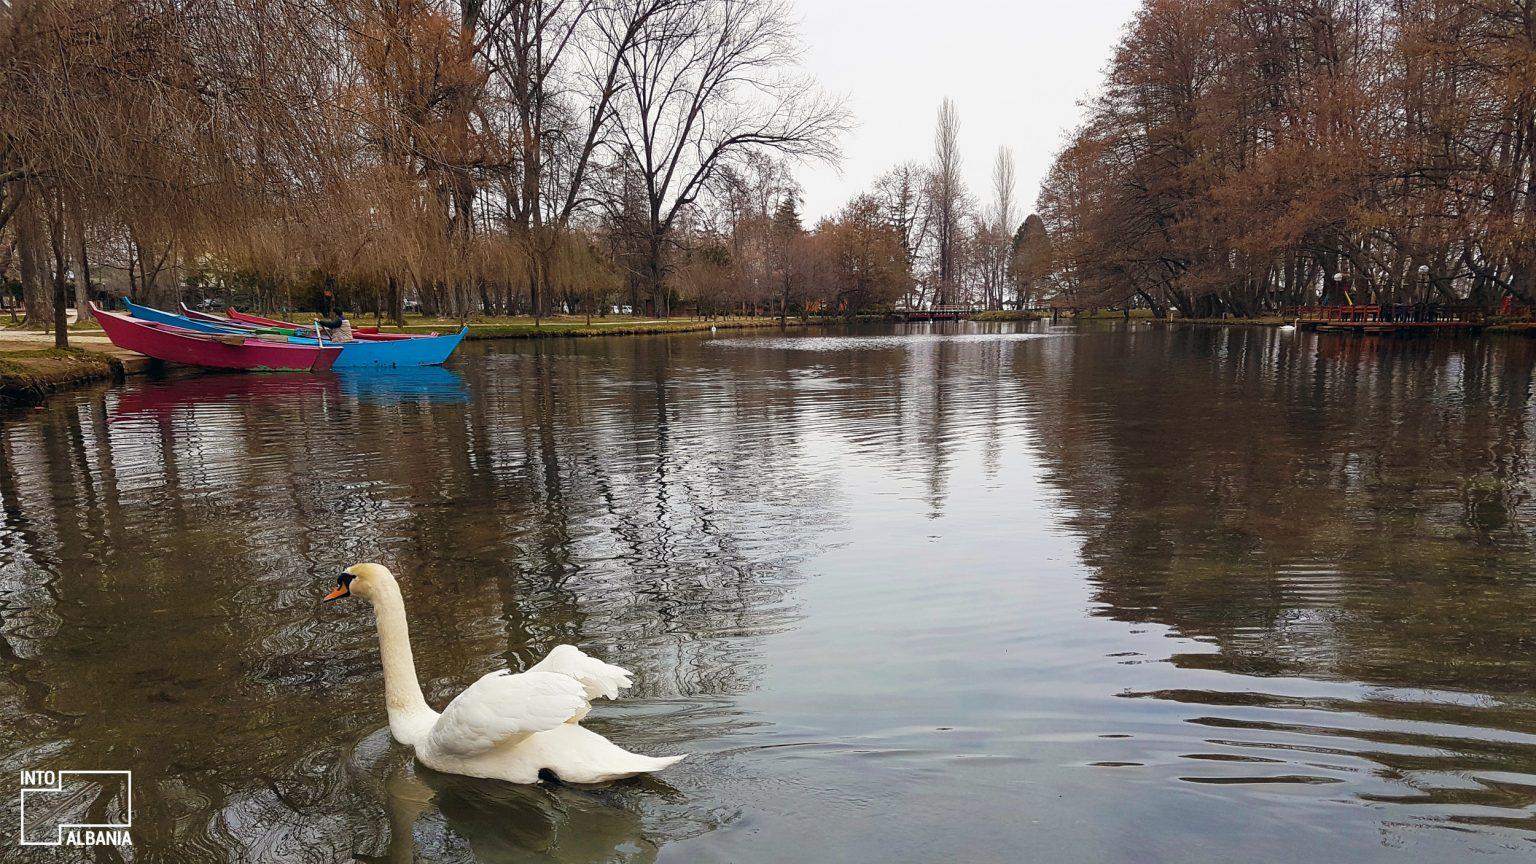 Drilon Springs in Pogradec, photo by IntoAlbania